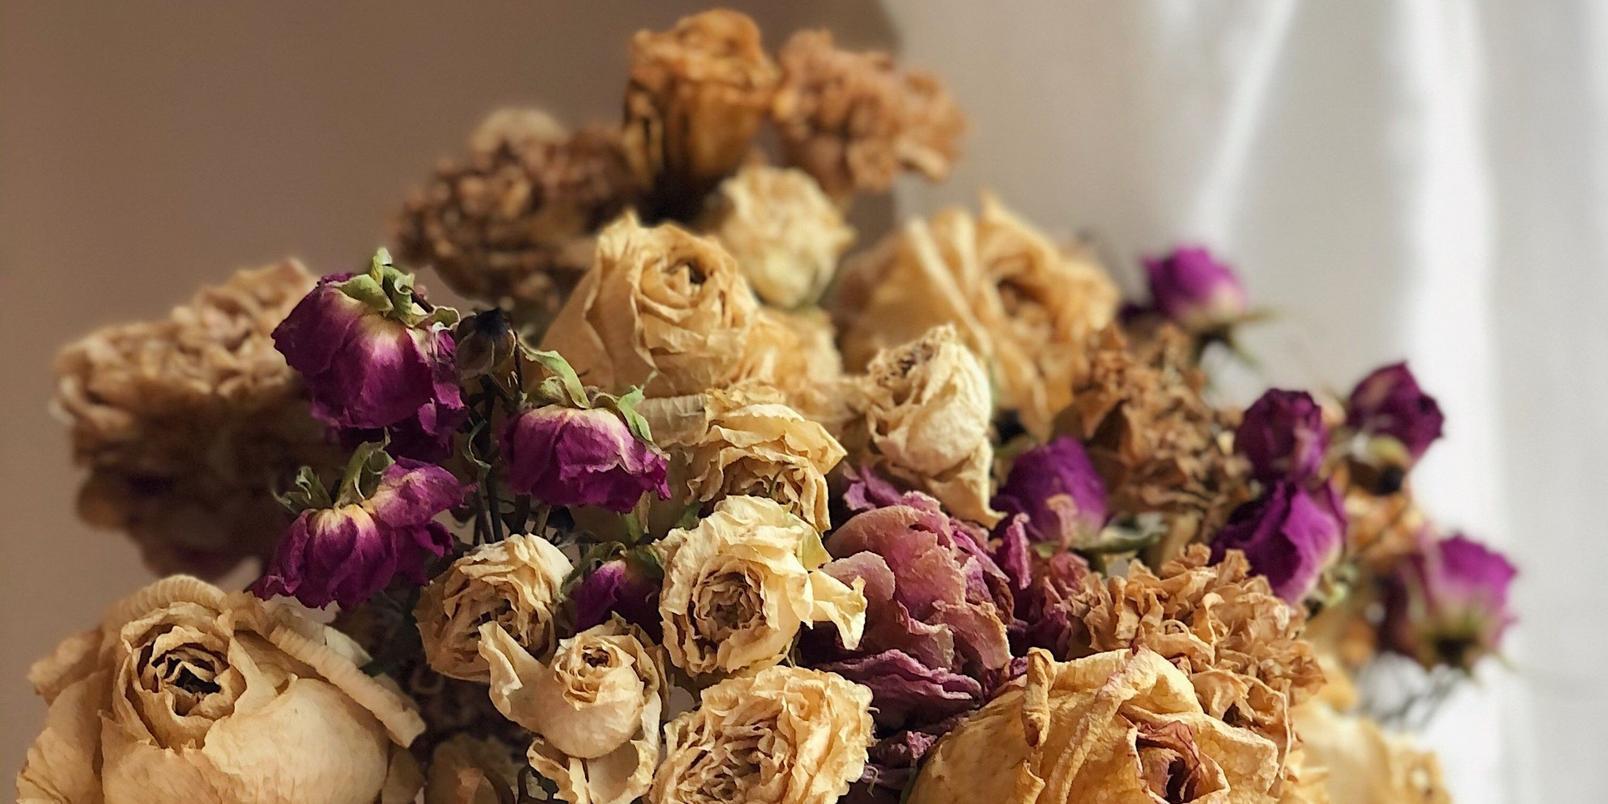 Dried-flowers